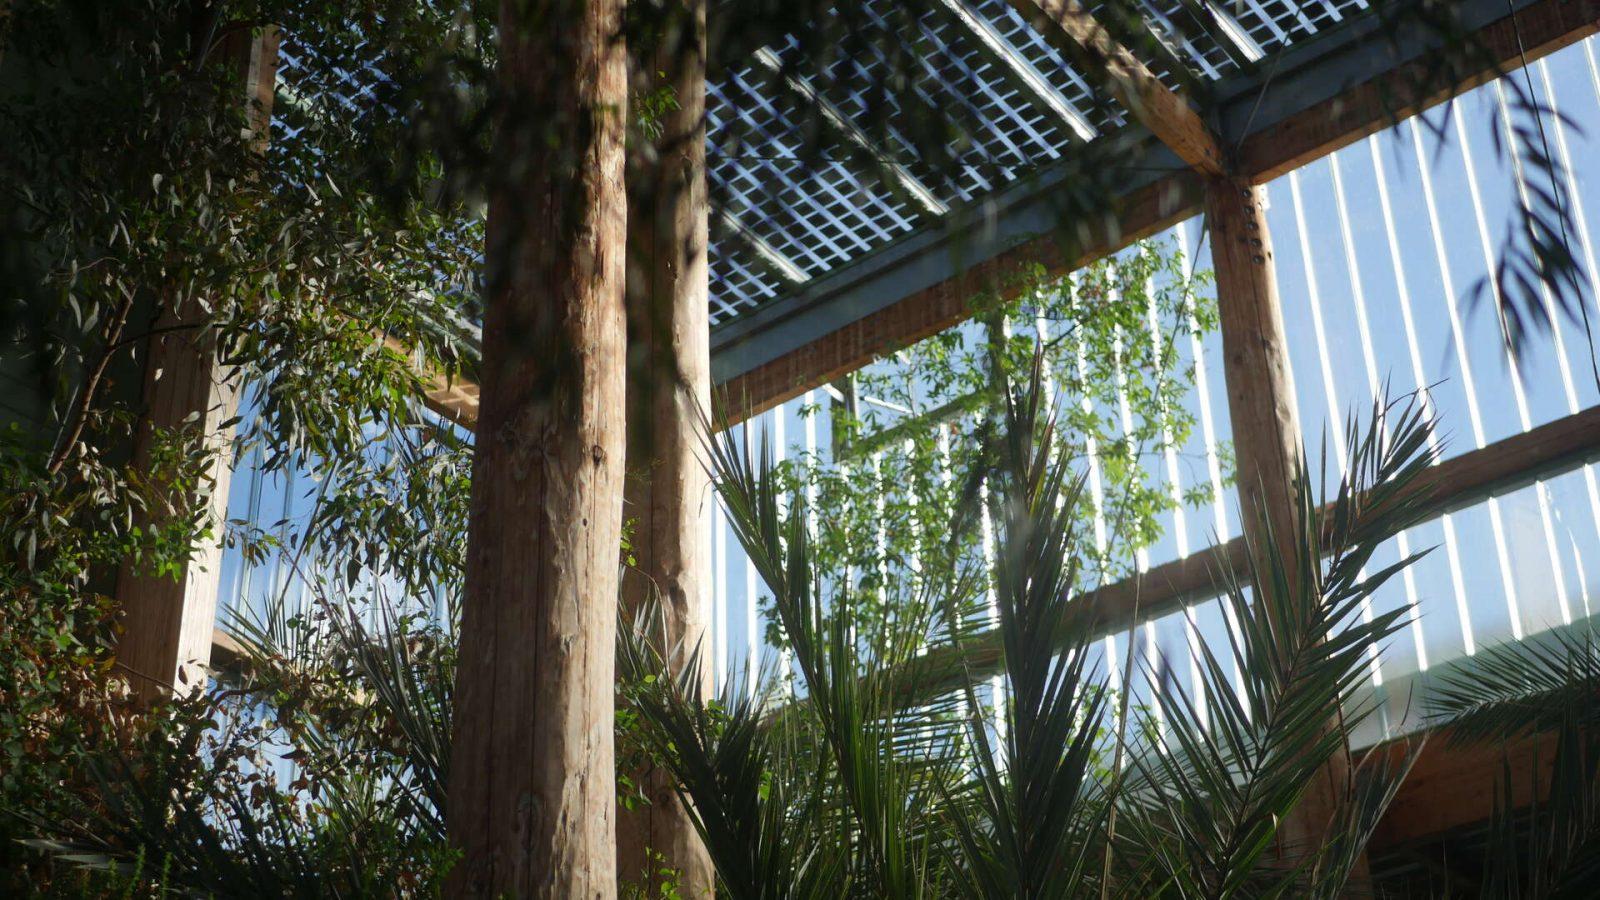 Jardin-botanique, les serres